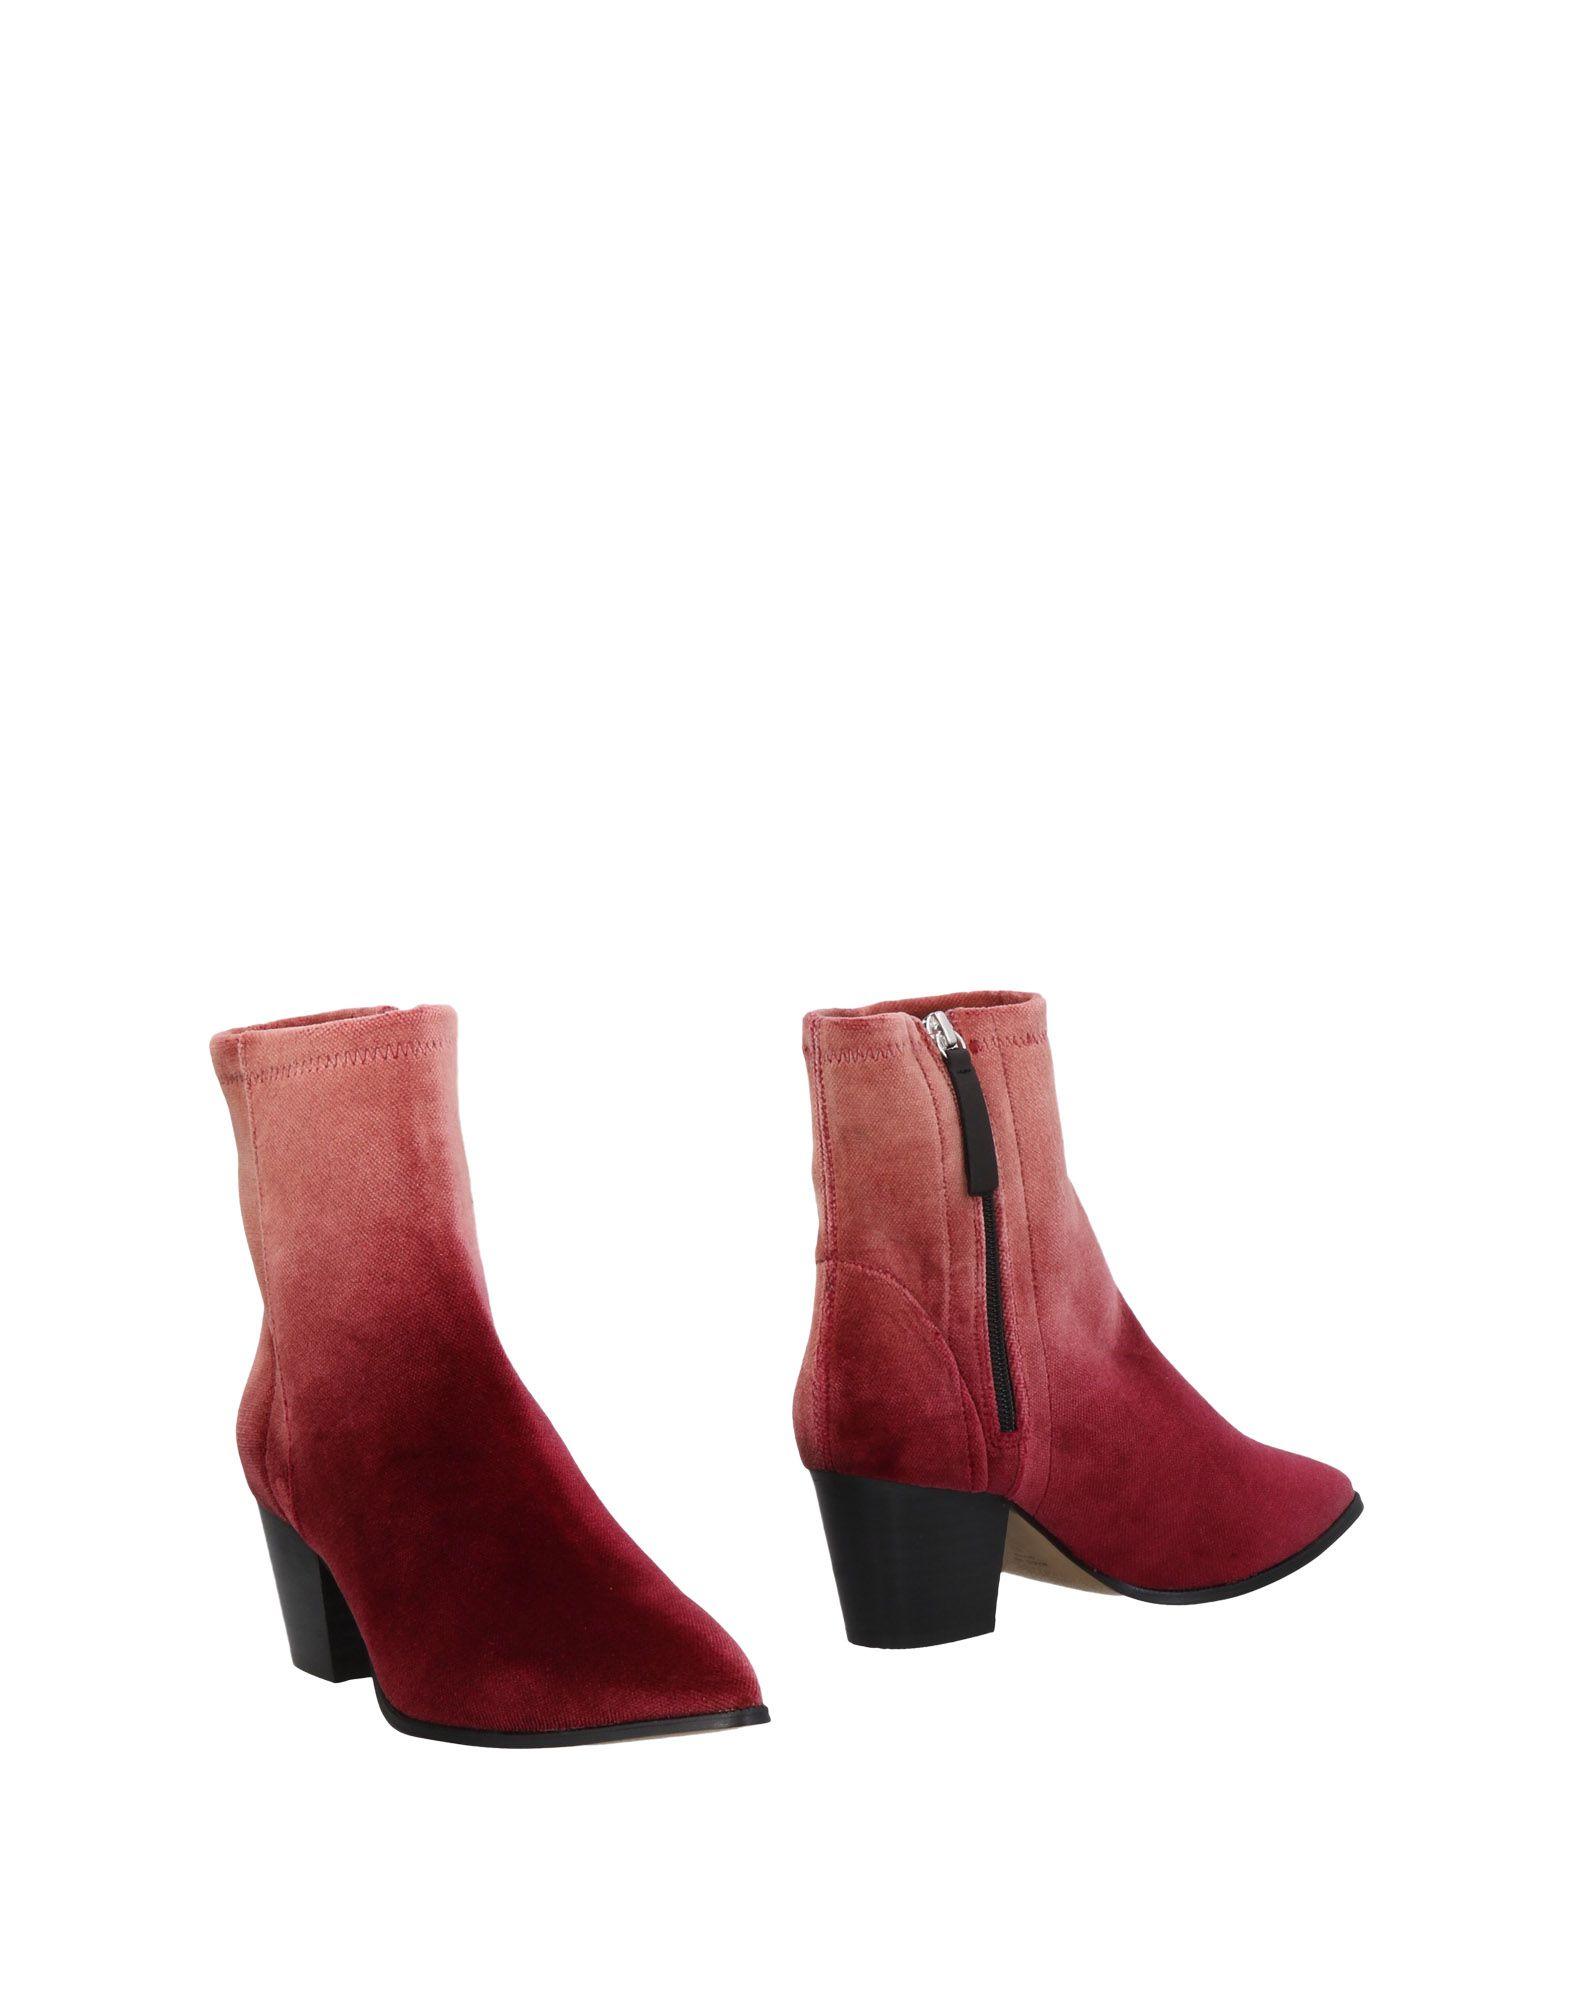 Stiù Ankle Boot - Women Stiù  Ankle Boots online on  Stiù Australia - 11461338KJ 8a4cb4